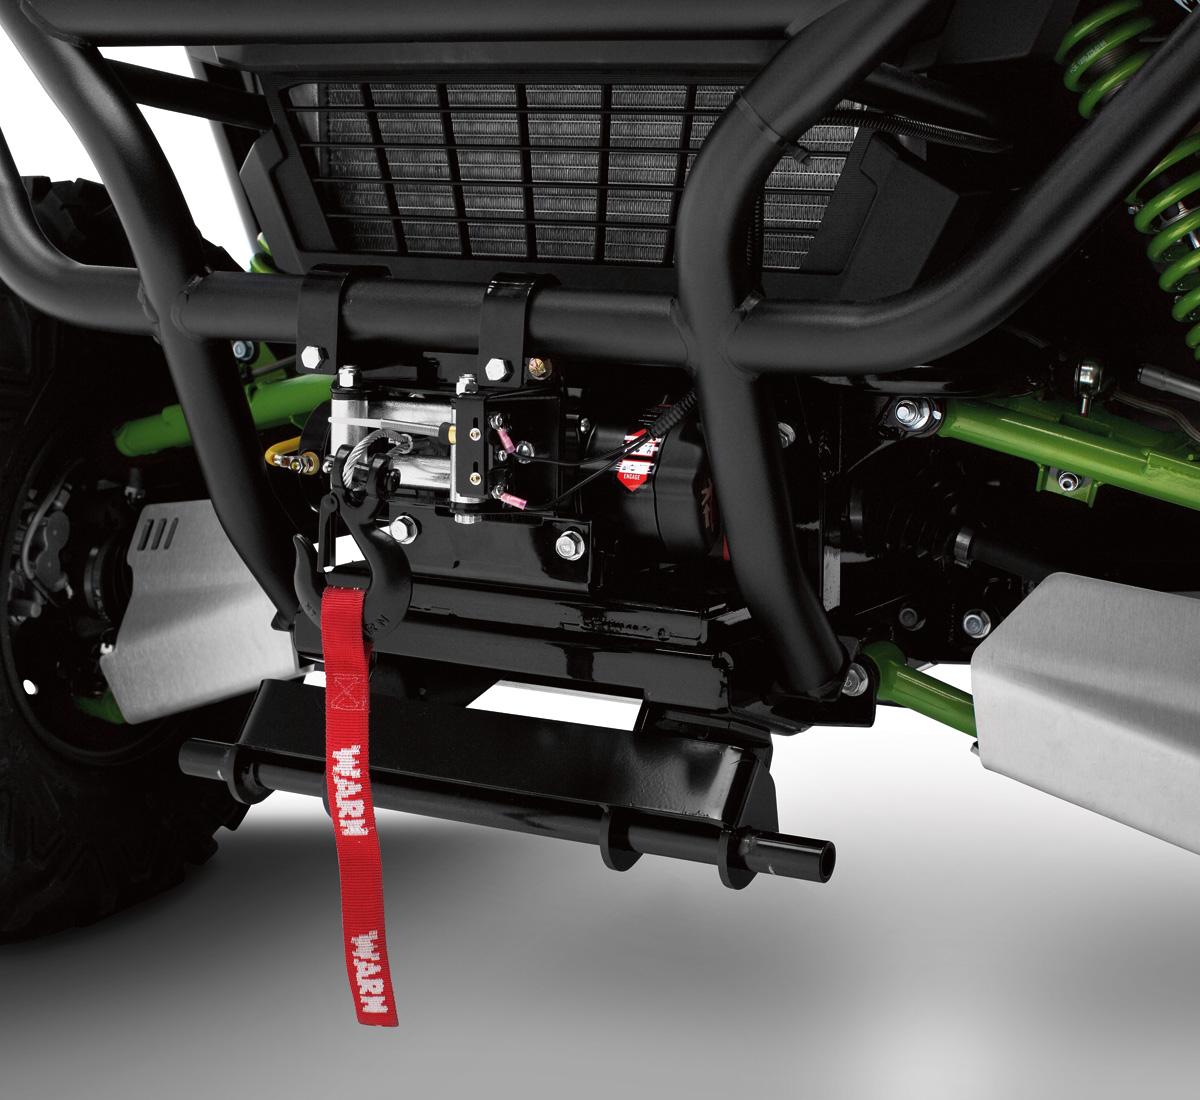 Kawasaki Teryx Winch Wiring Schematic Diagrams 2013 Diagram Enthusiast U2022 4 Seater